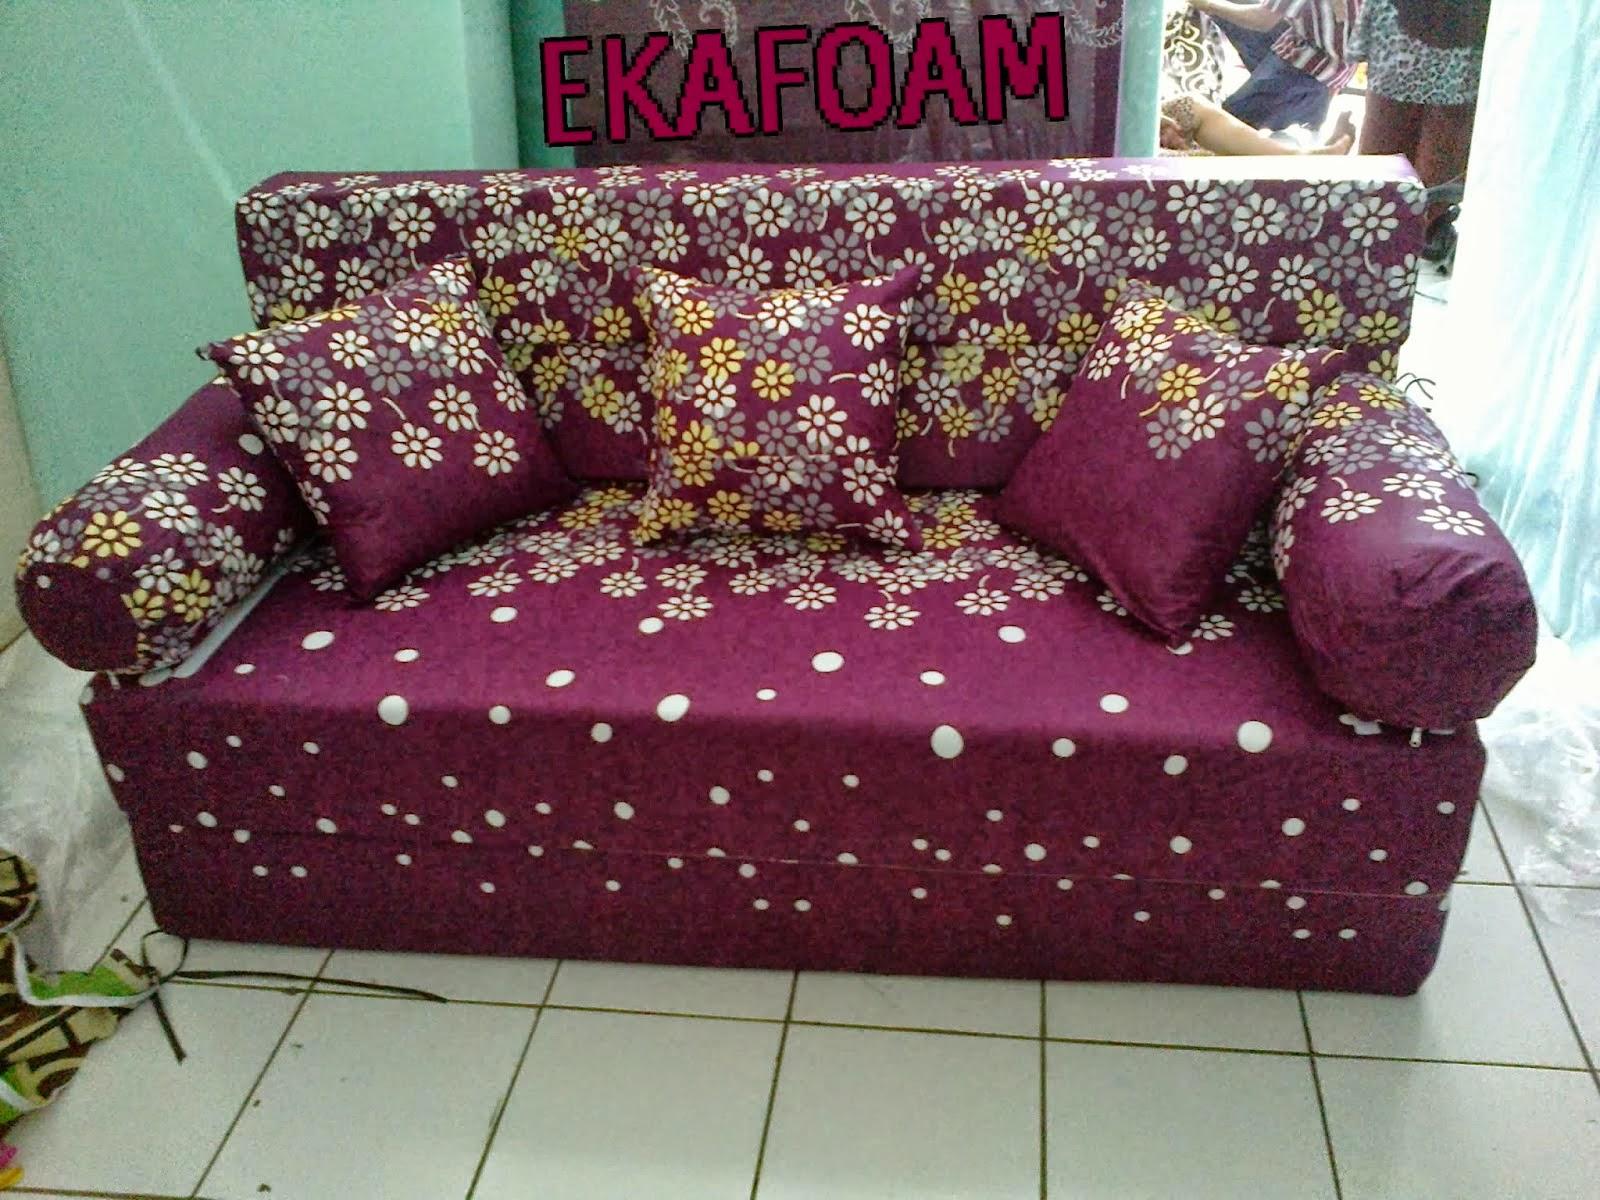 sofa bed kasur busa lipat inoac jakarta best sofas for pet owners 2016 agen tangerang